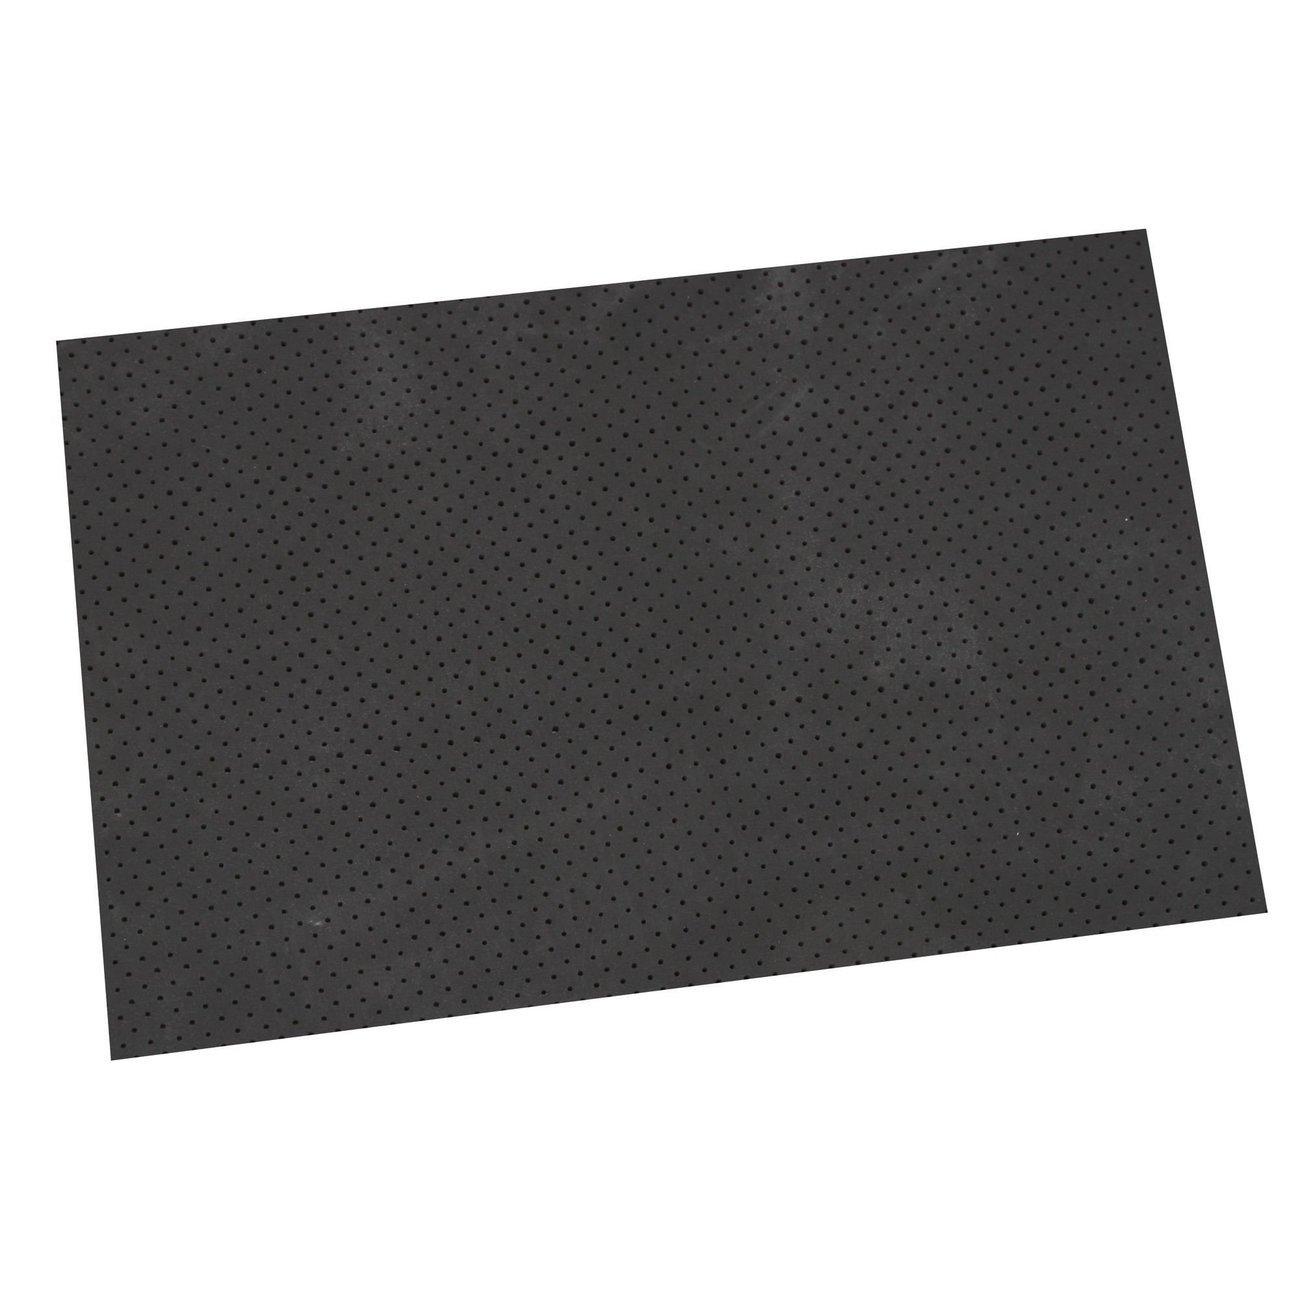 Kerbl Sattelunterlage Covalliero Anti-Slip, 60 x 45 x 0,6 cm